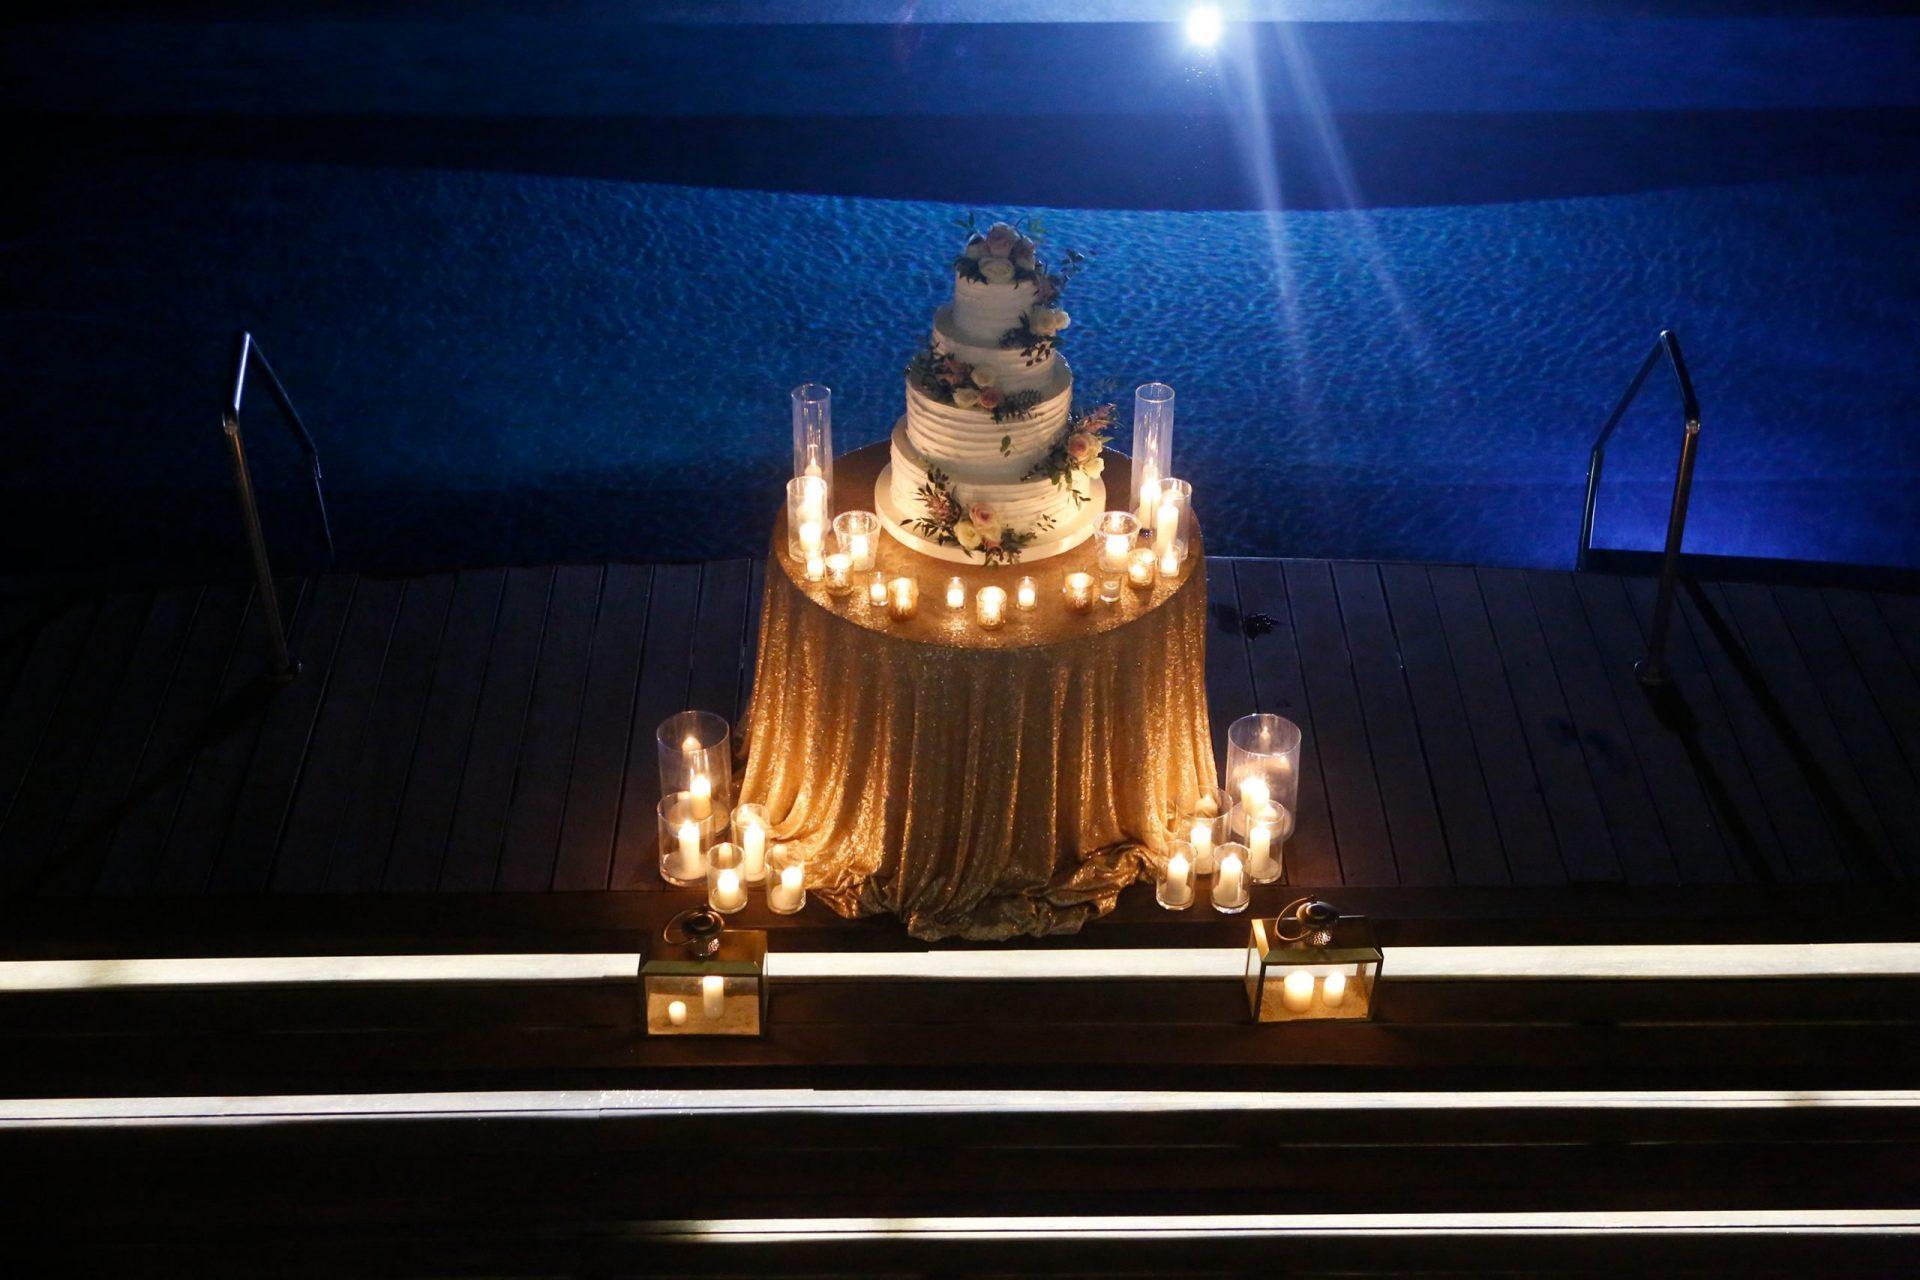 Gloria and Giovanni, the wedding cake table